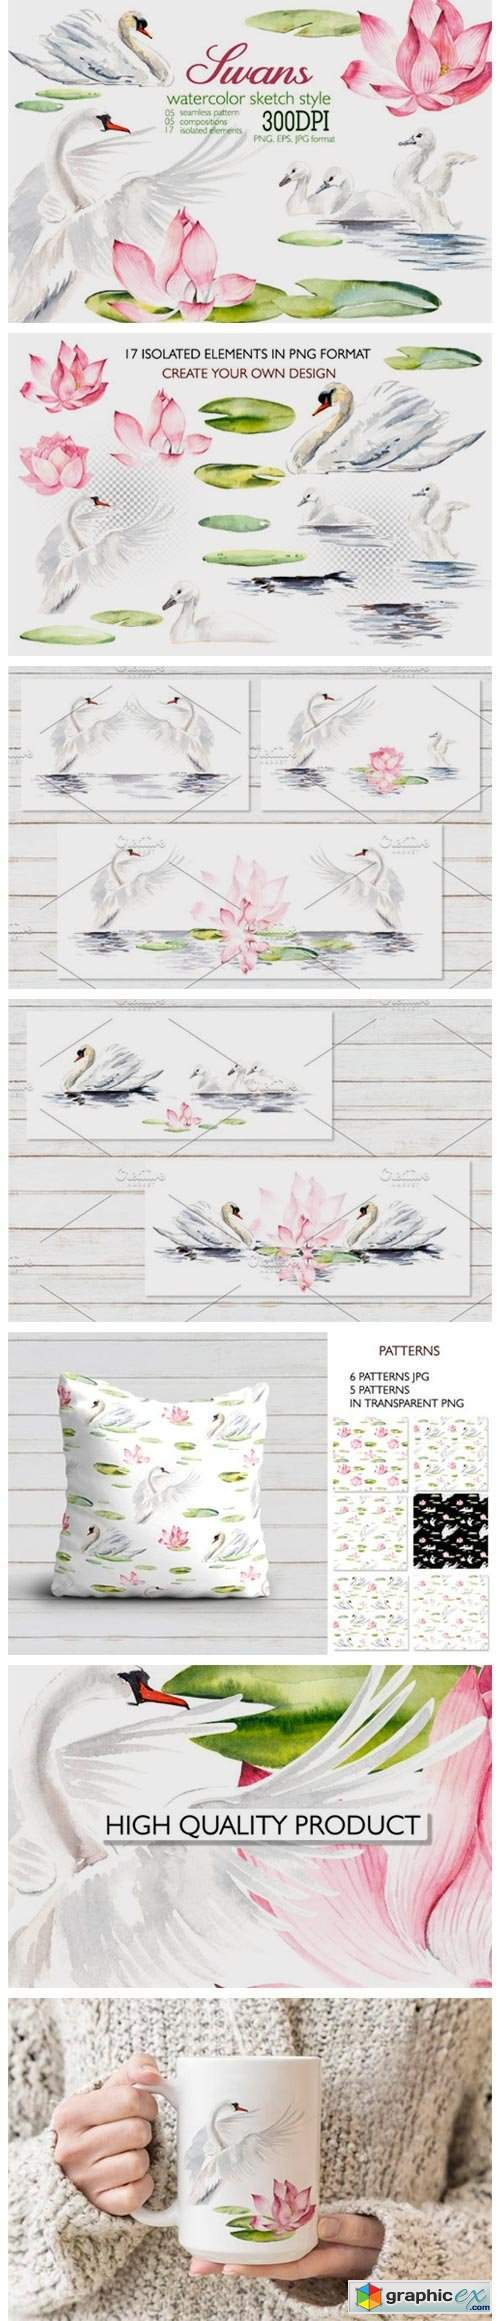 Watercolor Swans